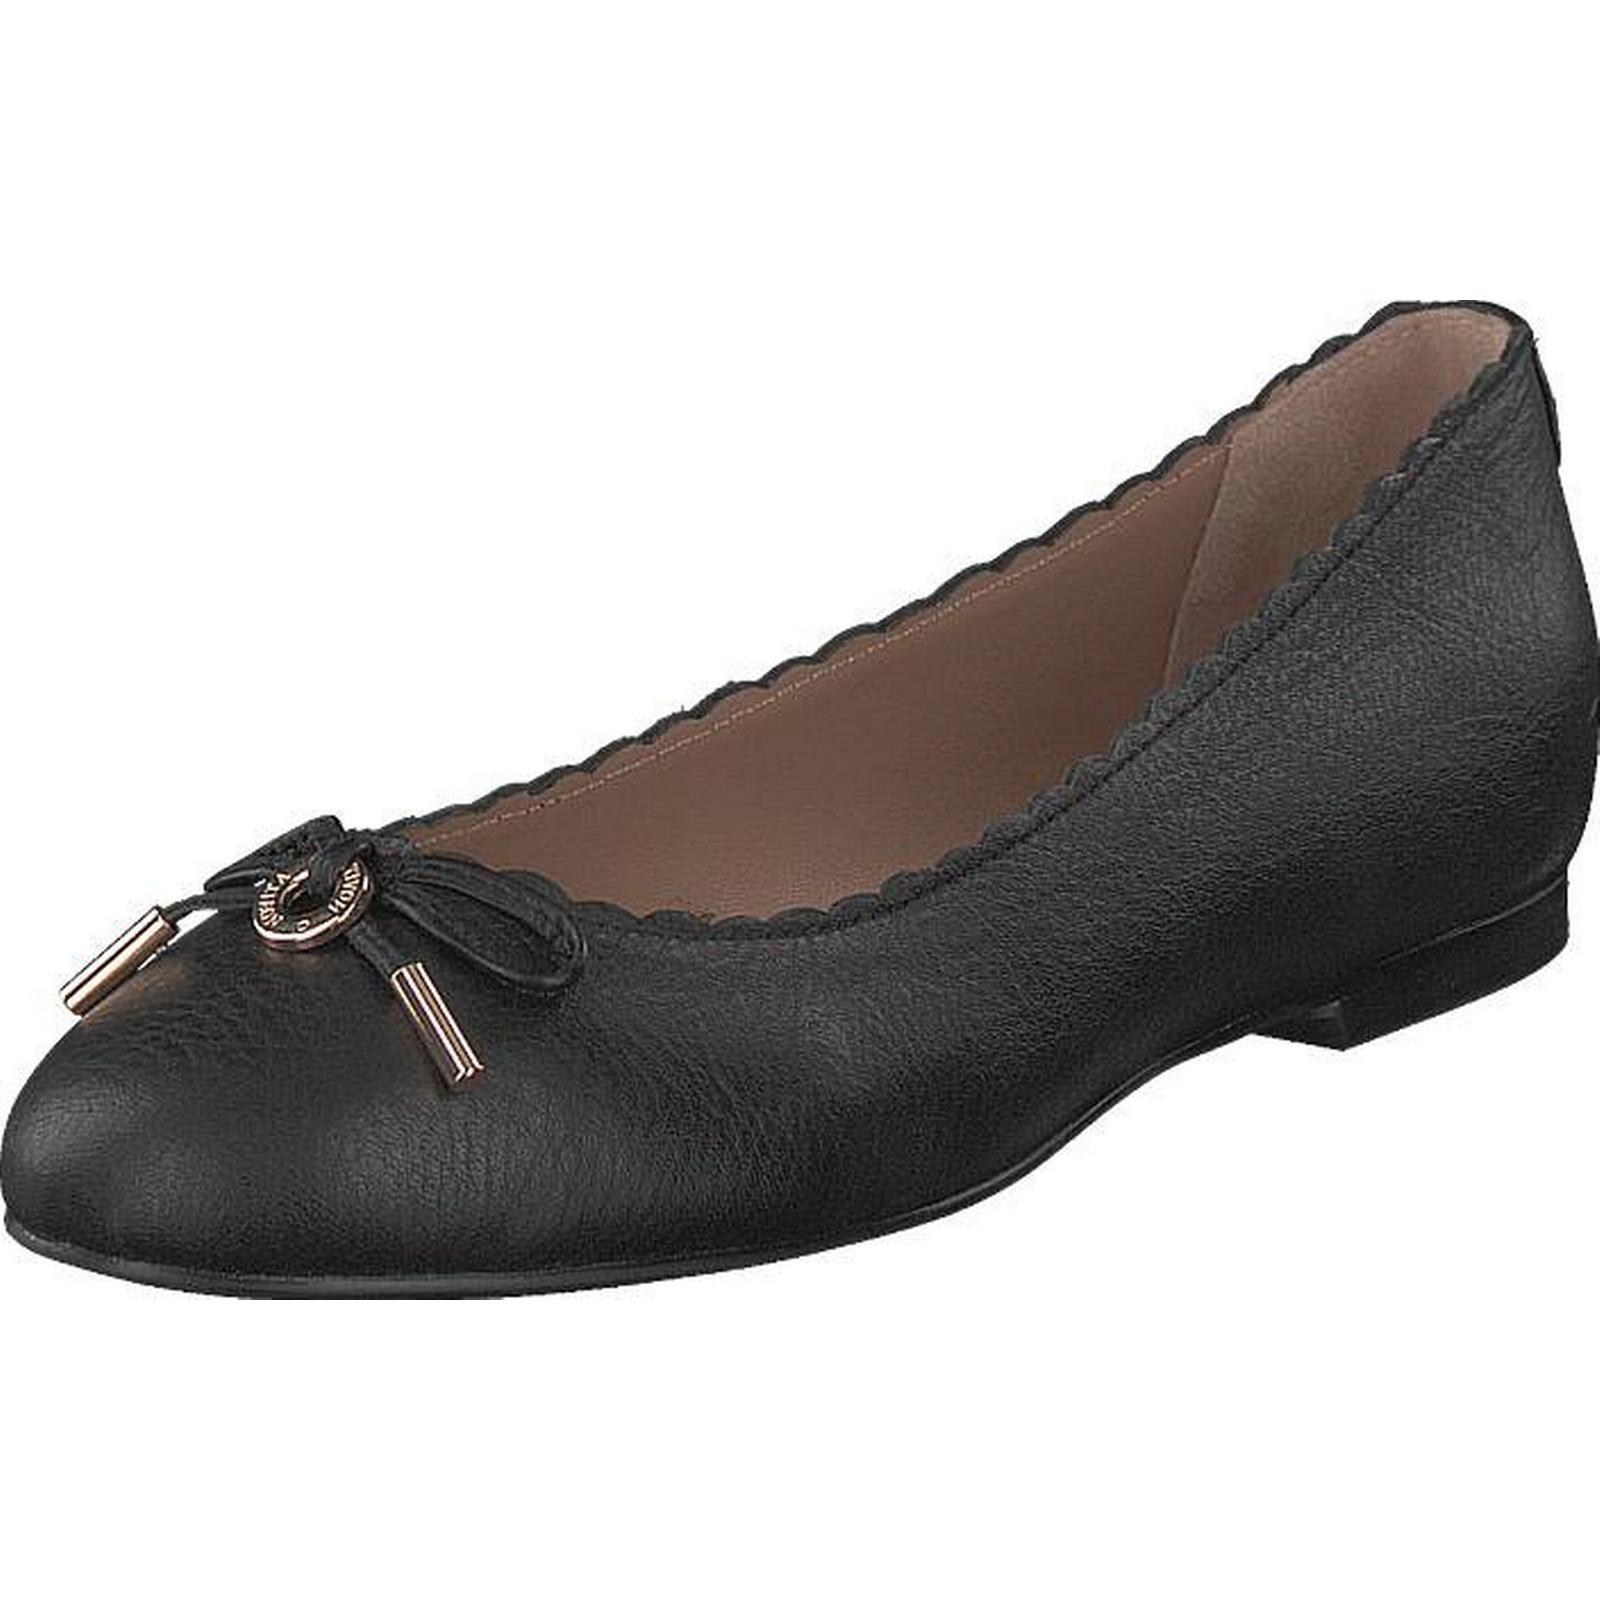 Novita Ballerina Black Black, Shoes, Flats, Ballerina Ballerina Flats, Shoes, Grey, Female, 36 a7b443